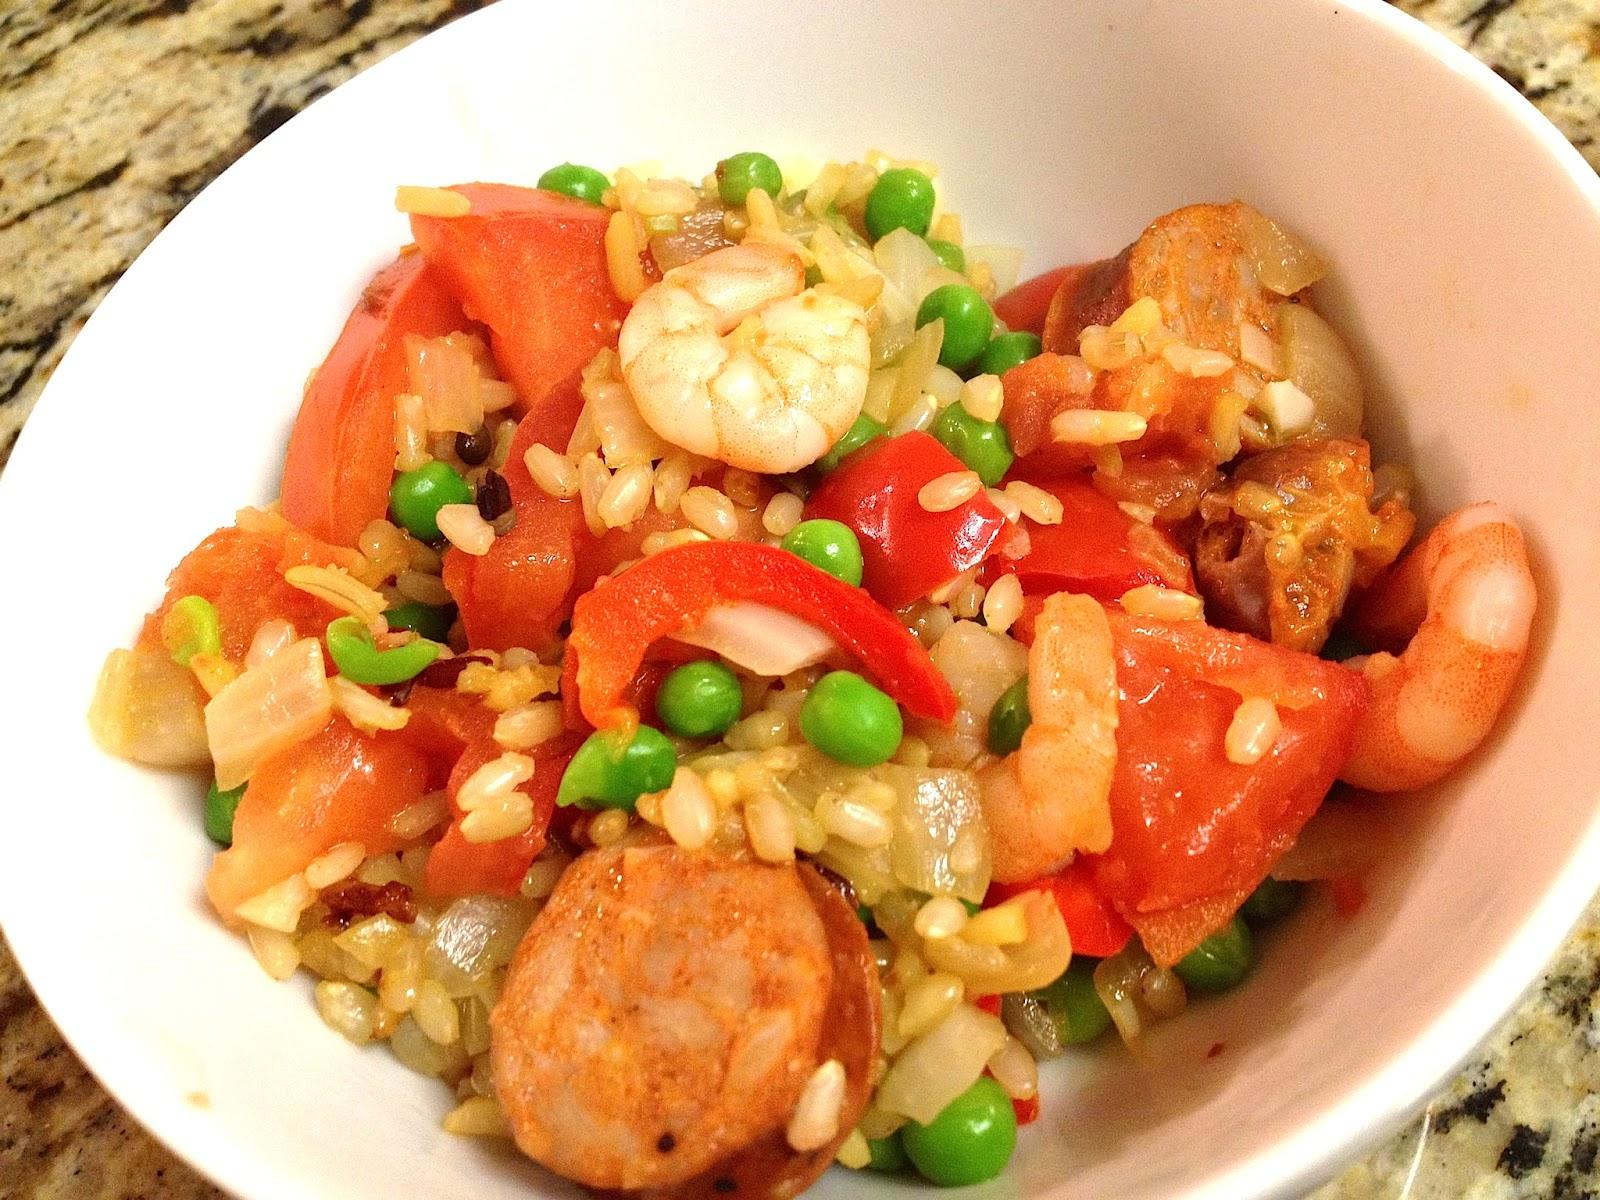 thirdculturefoodie: Shrimp and Chorizo Paella